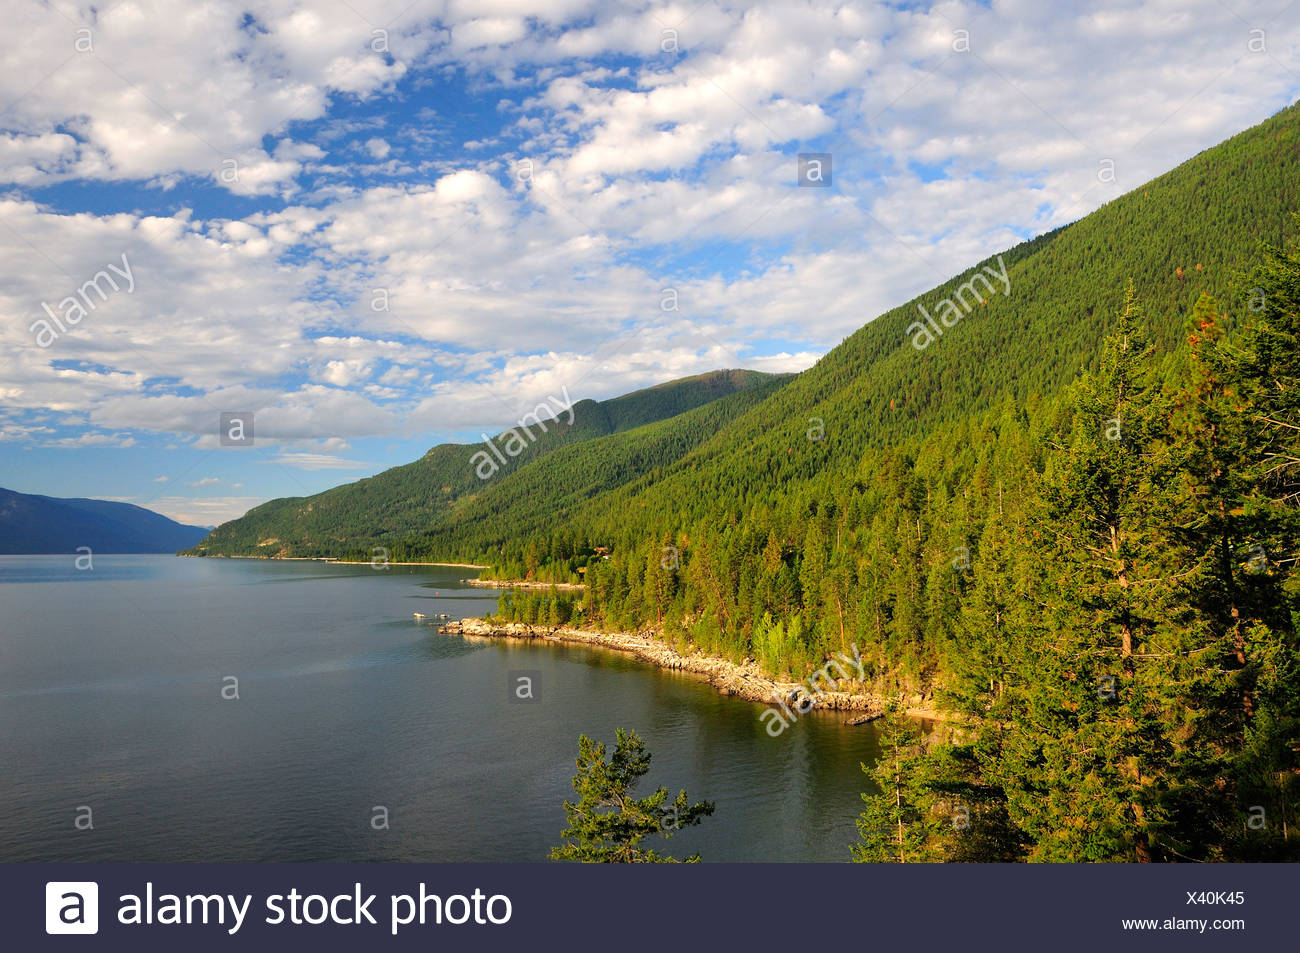 Canada Kootenay Lake near Crawford Bay British Columbia Rocky mountains Rockies nature landscape scenery forest - Stock Image